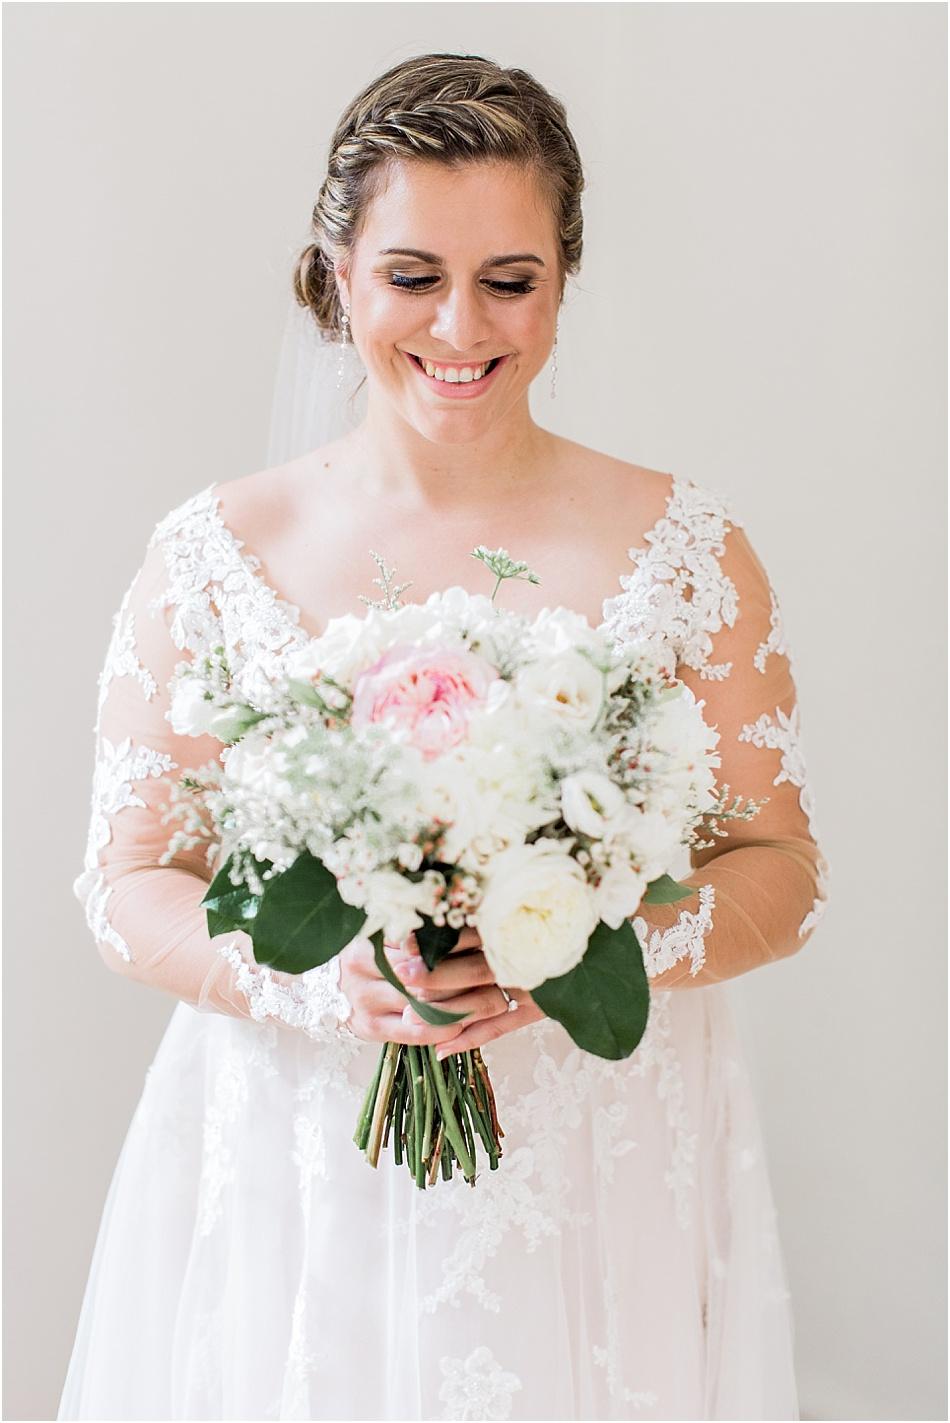 brookside_country_club_cape_cod_boston_wedding_photographer_Meredith_Jane_Photography_photo_0129.jpg